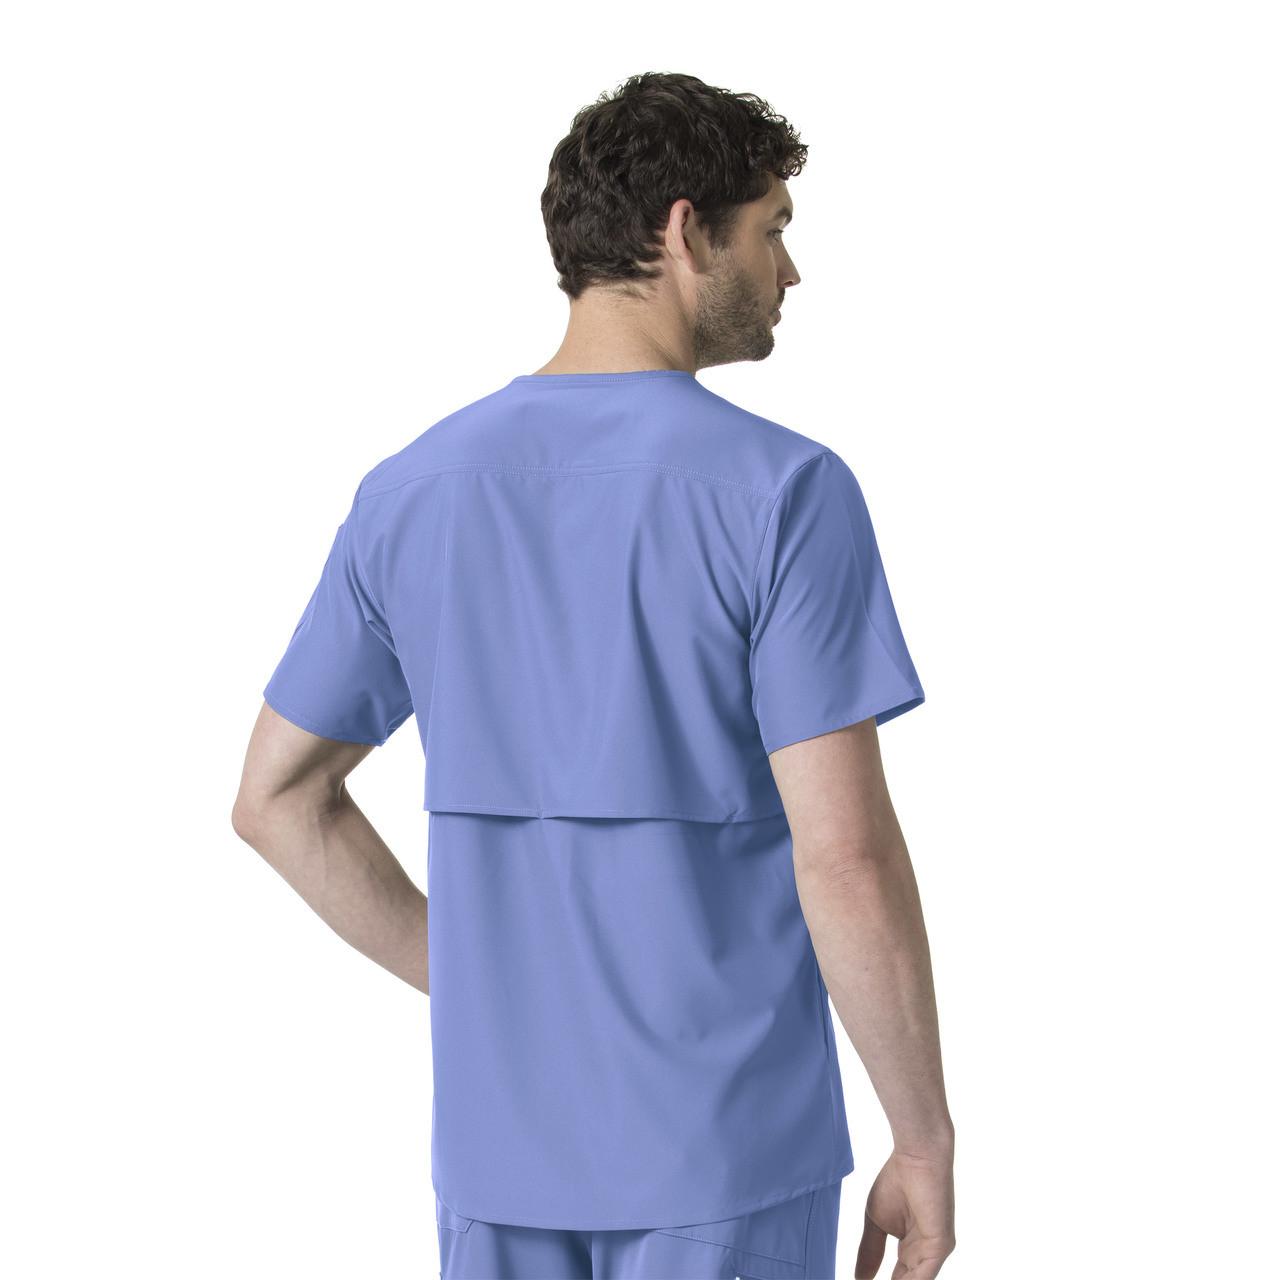 (C15106) Carhartt Liberty Men's Slim Fit V-Neck Scrub Top - Back